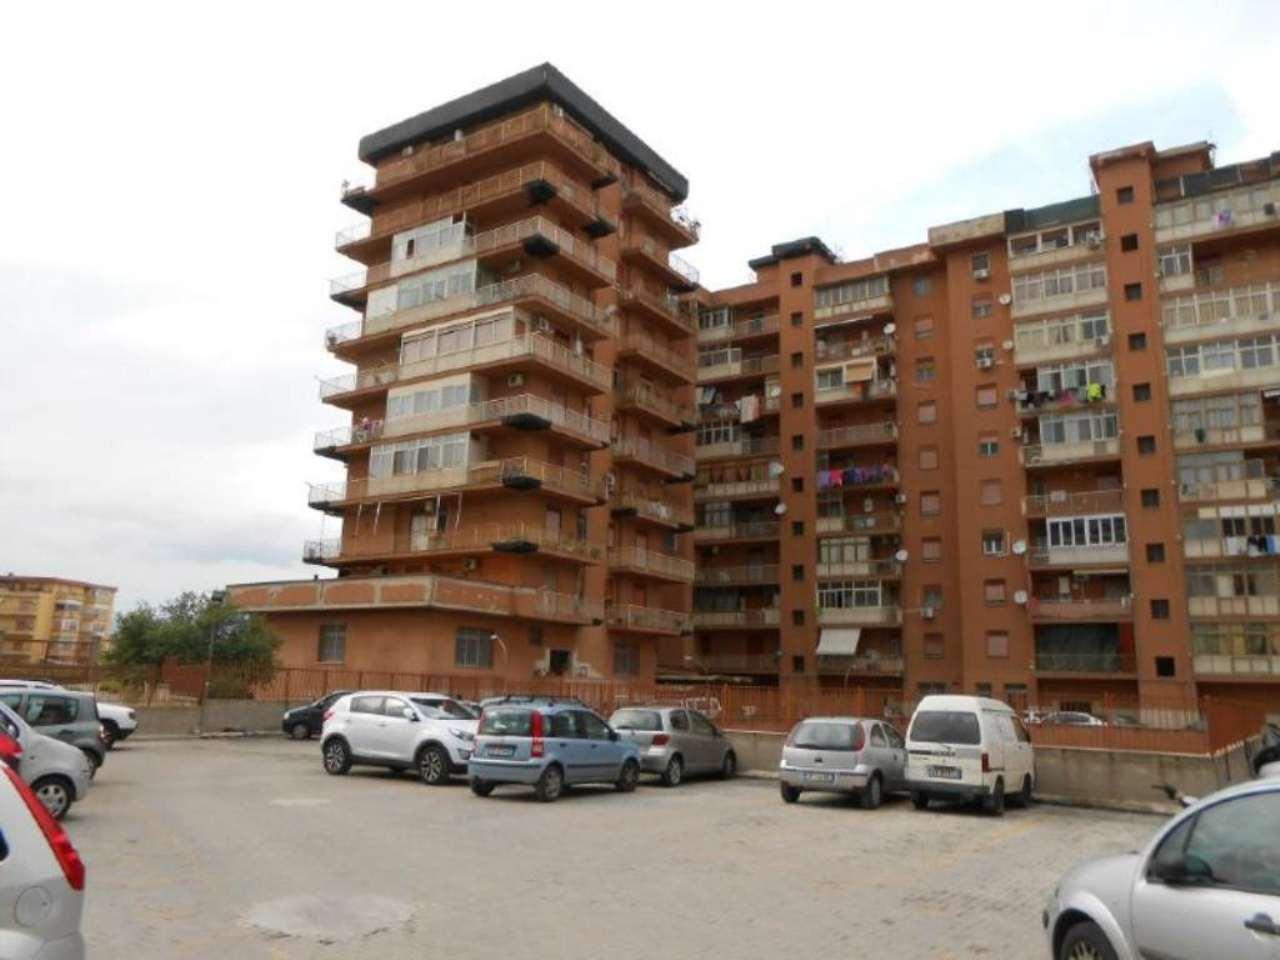 Bilocale Palermo Largo Os 9